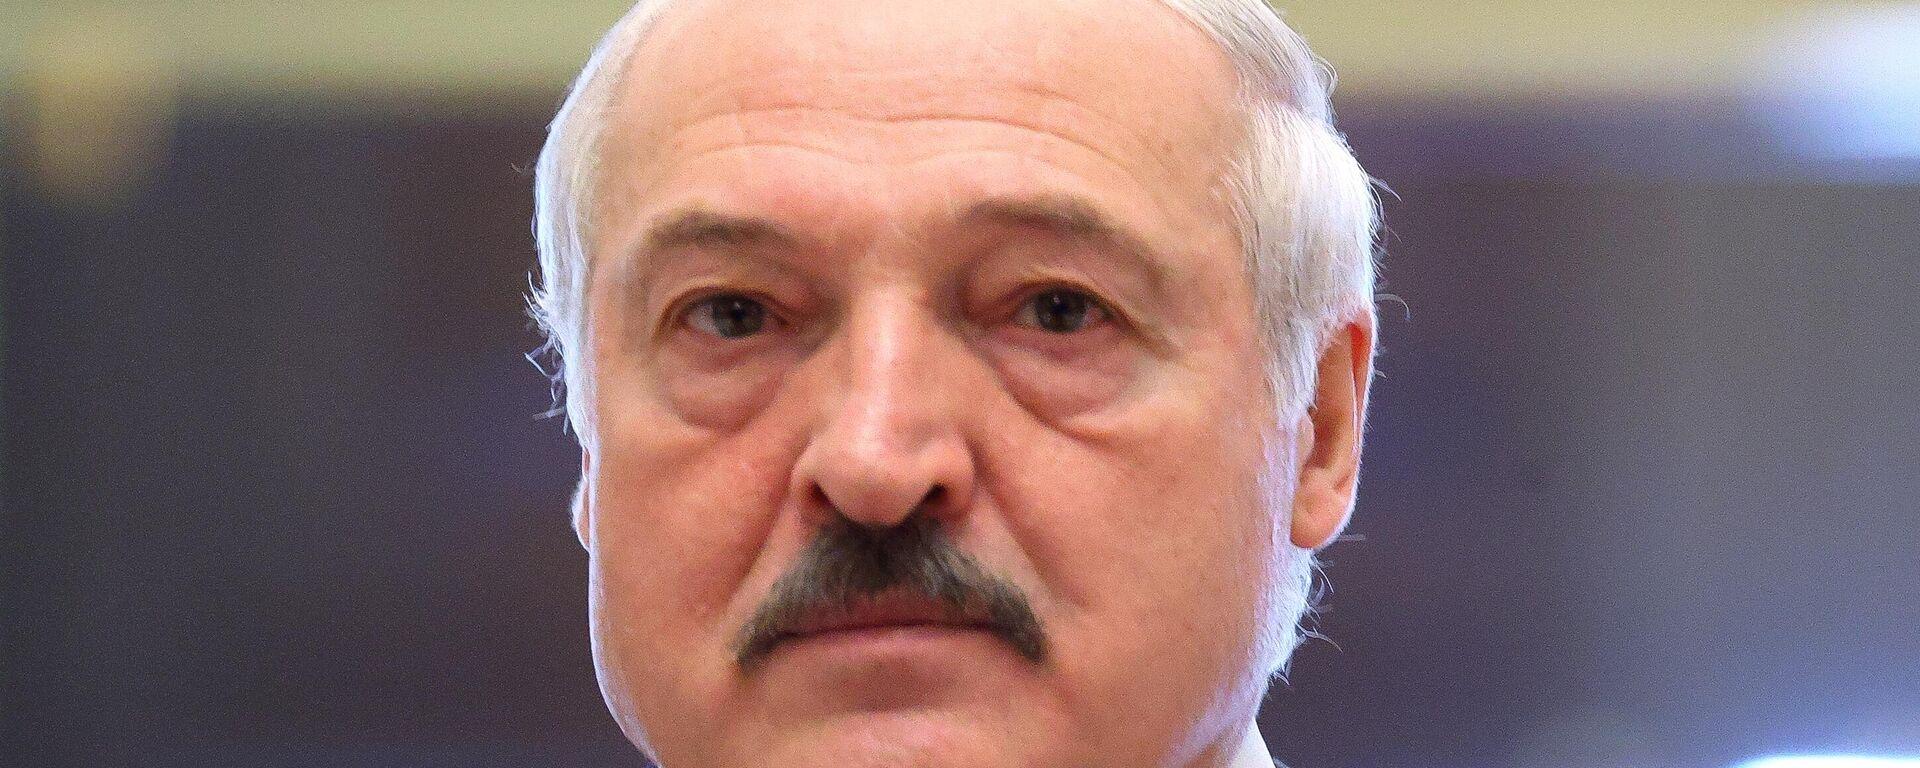 Президент Белоруссии Александр Лукашенко  - Sputnik Таджикистан, 1920, 17.09.2021